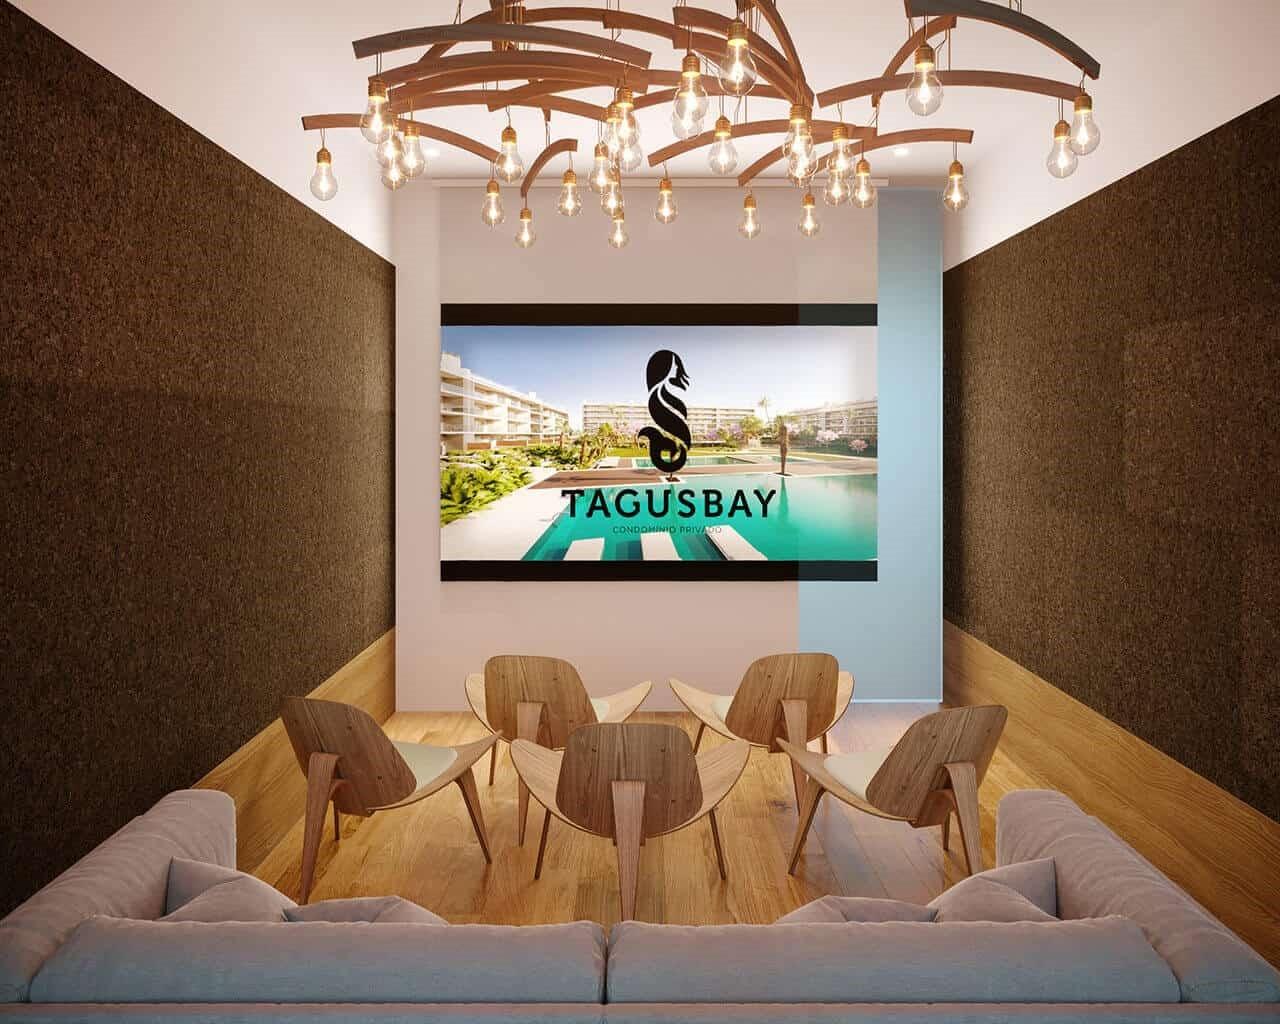 Tagus Bay - media room